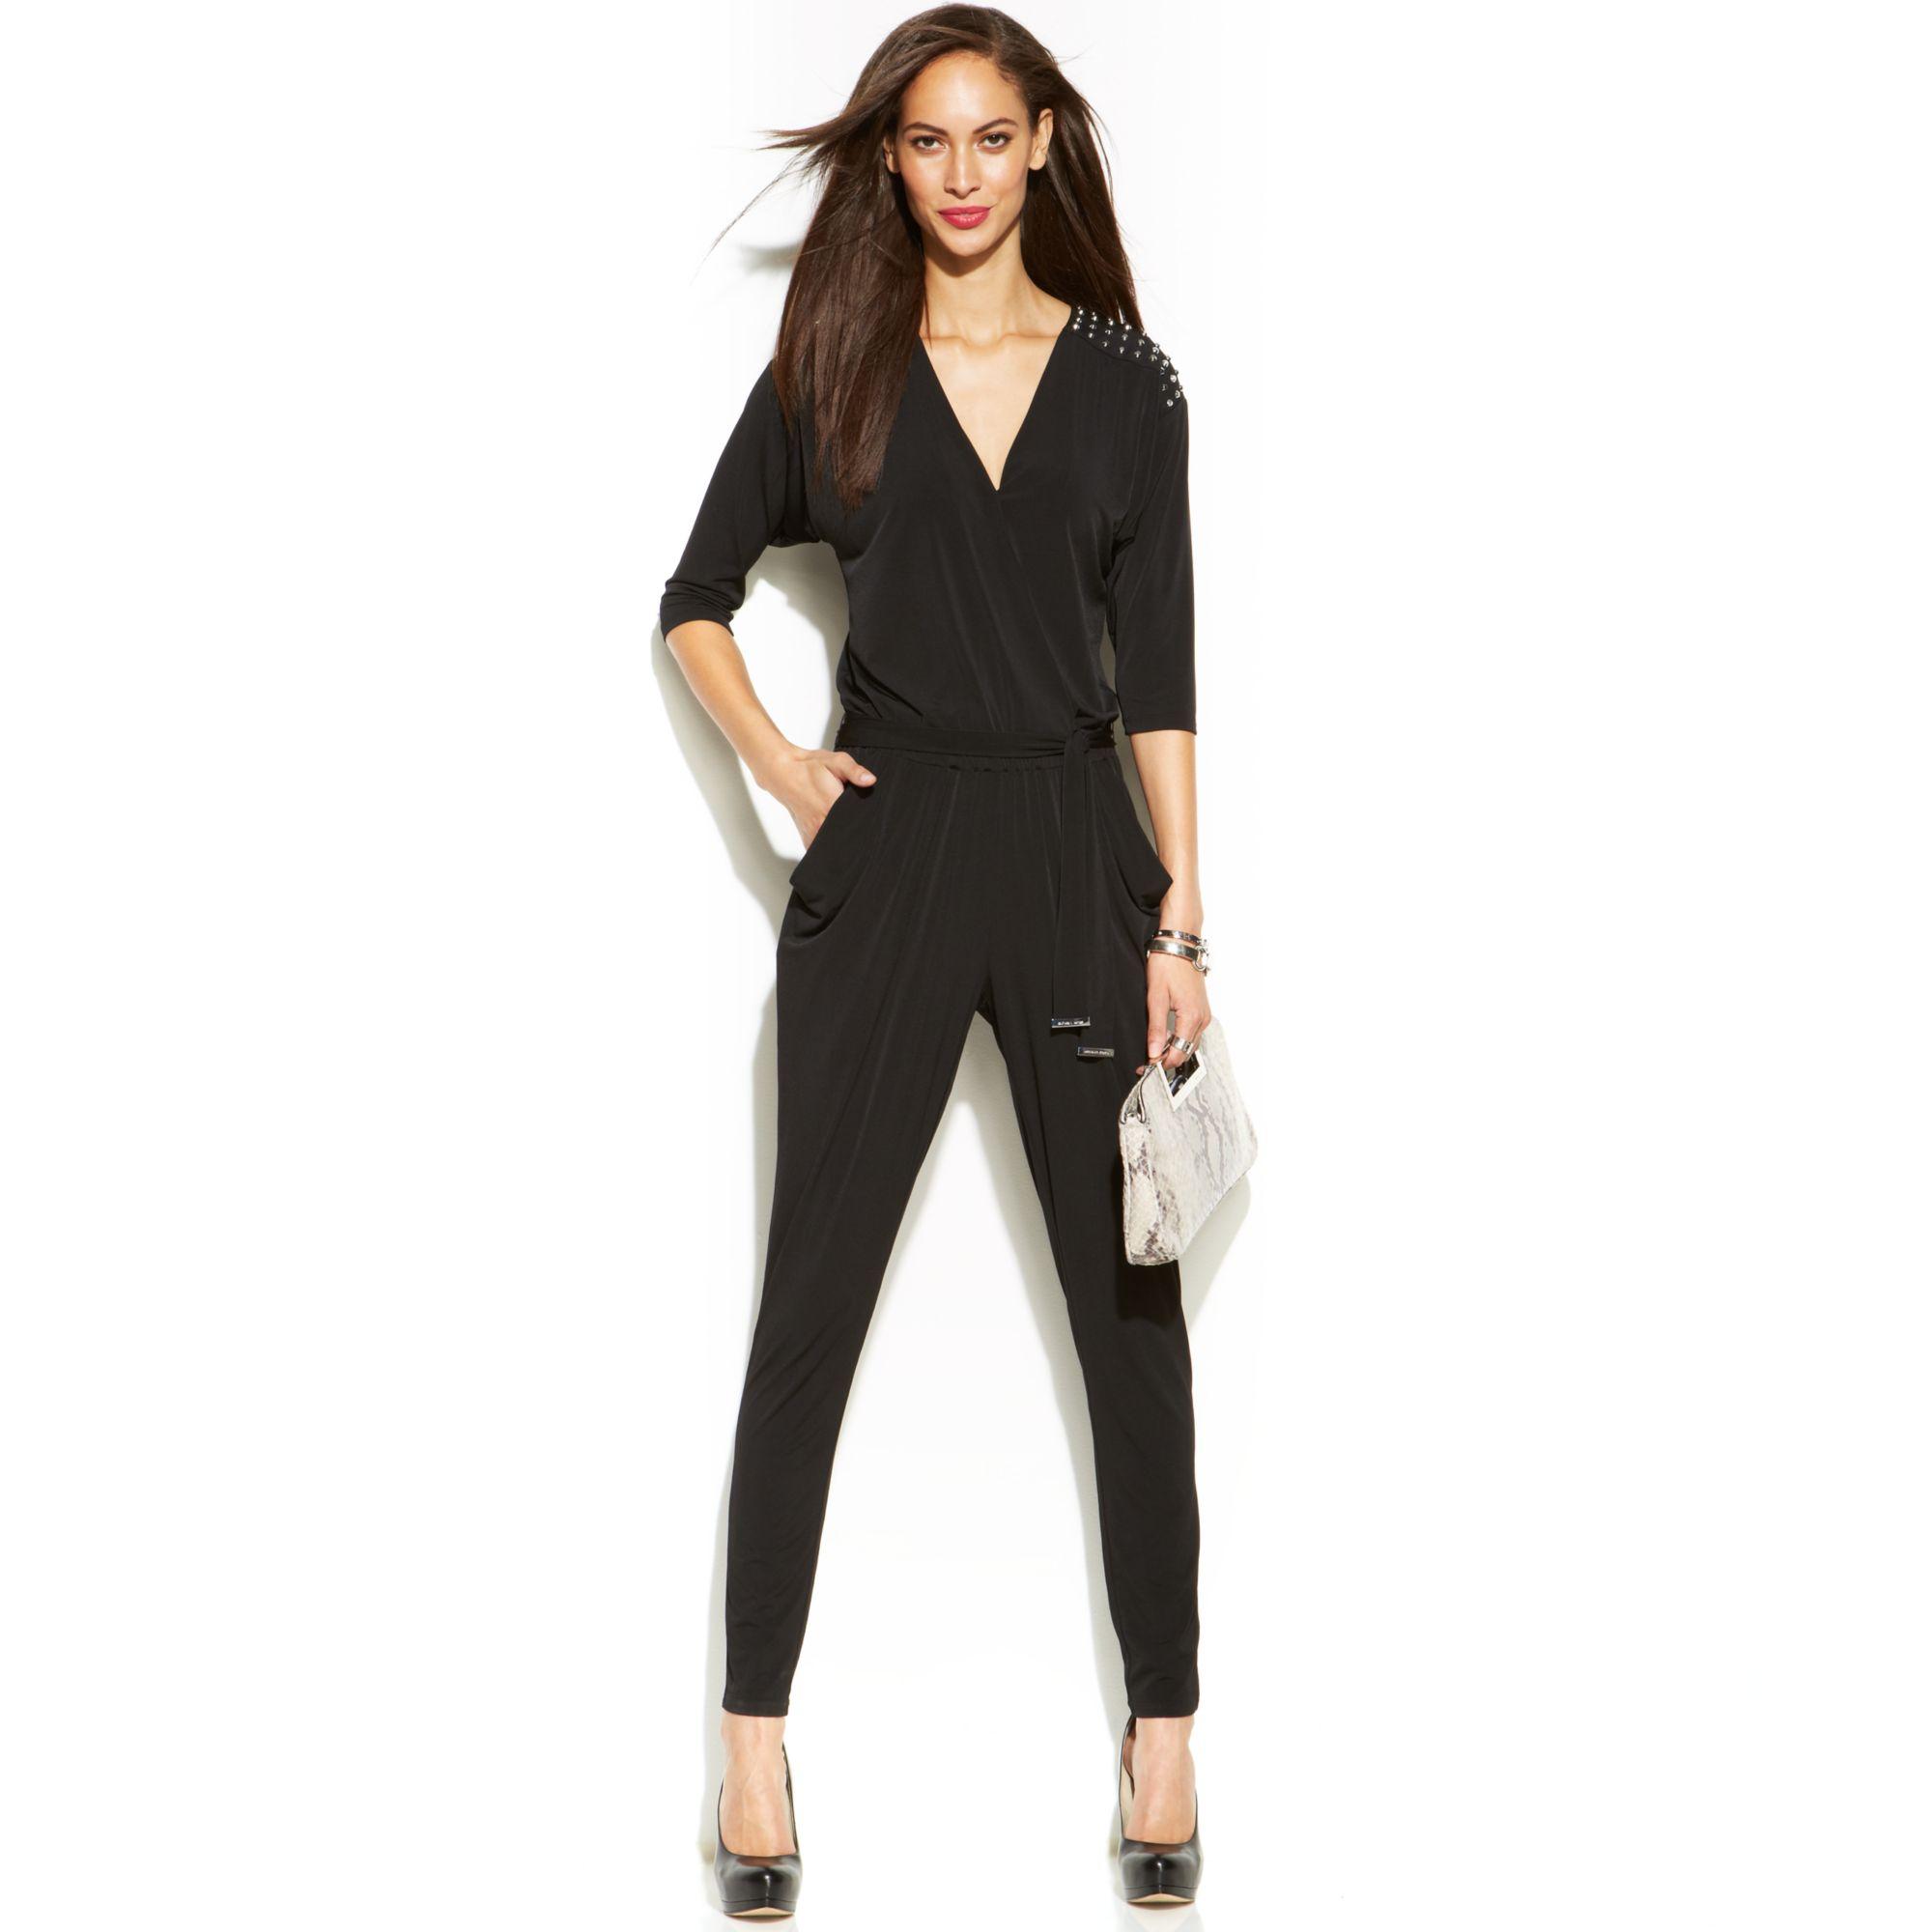 941c4773cb9d Lyst - Michael Kors Michael Slimleg Studded Jumpsuit in Black